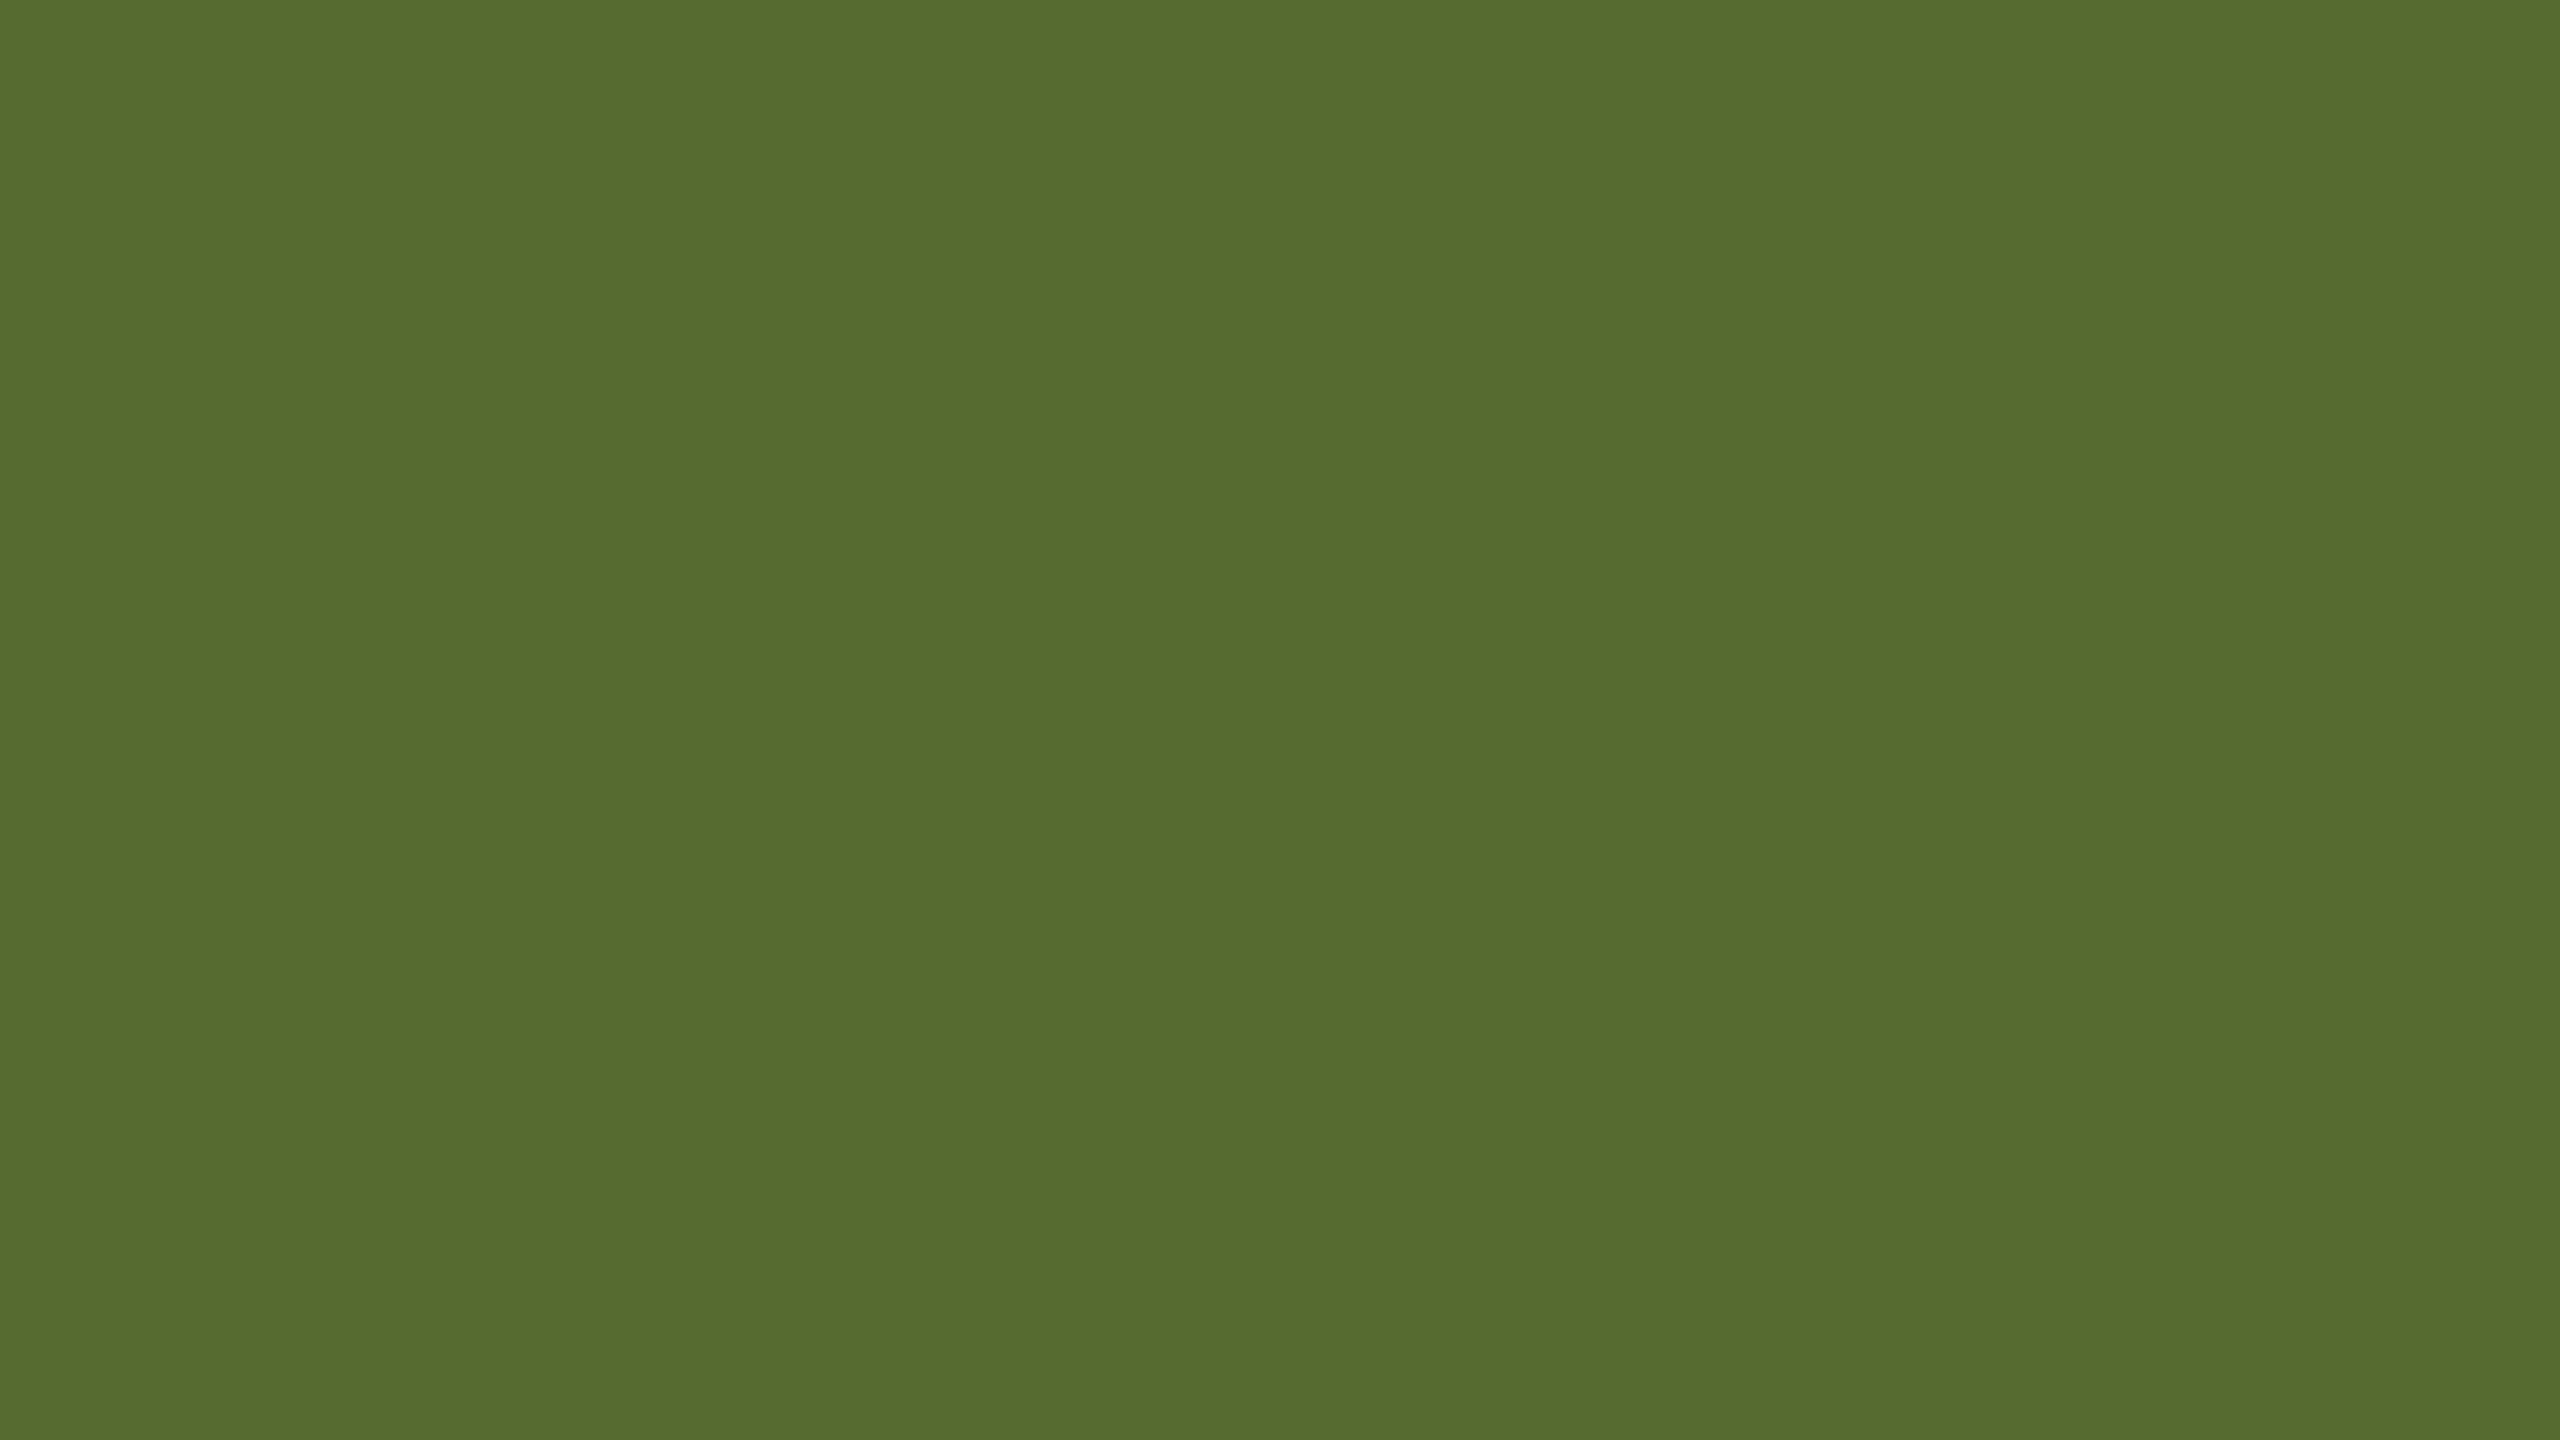 Olive Green Wallpaper 2560x1440